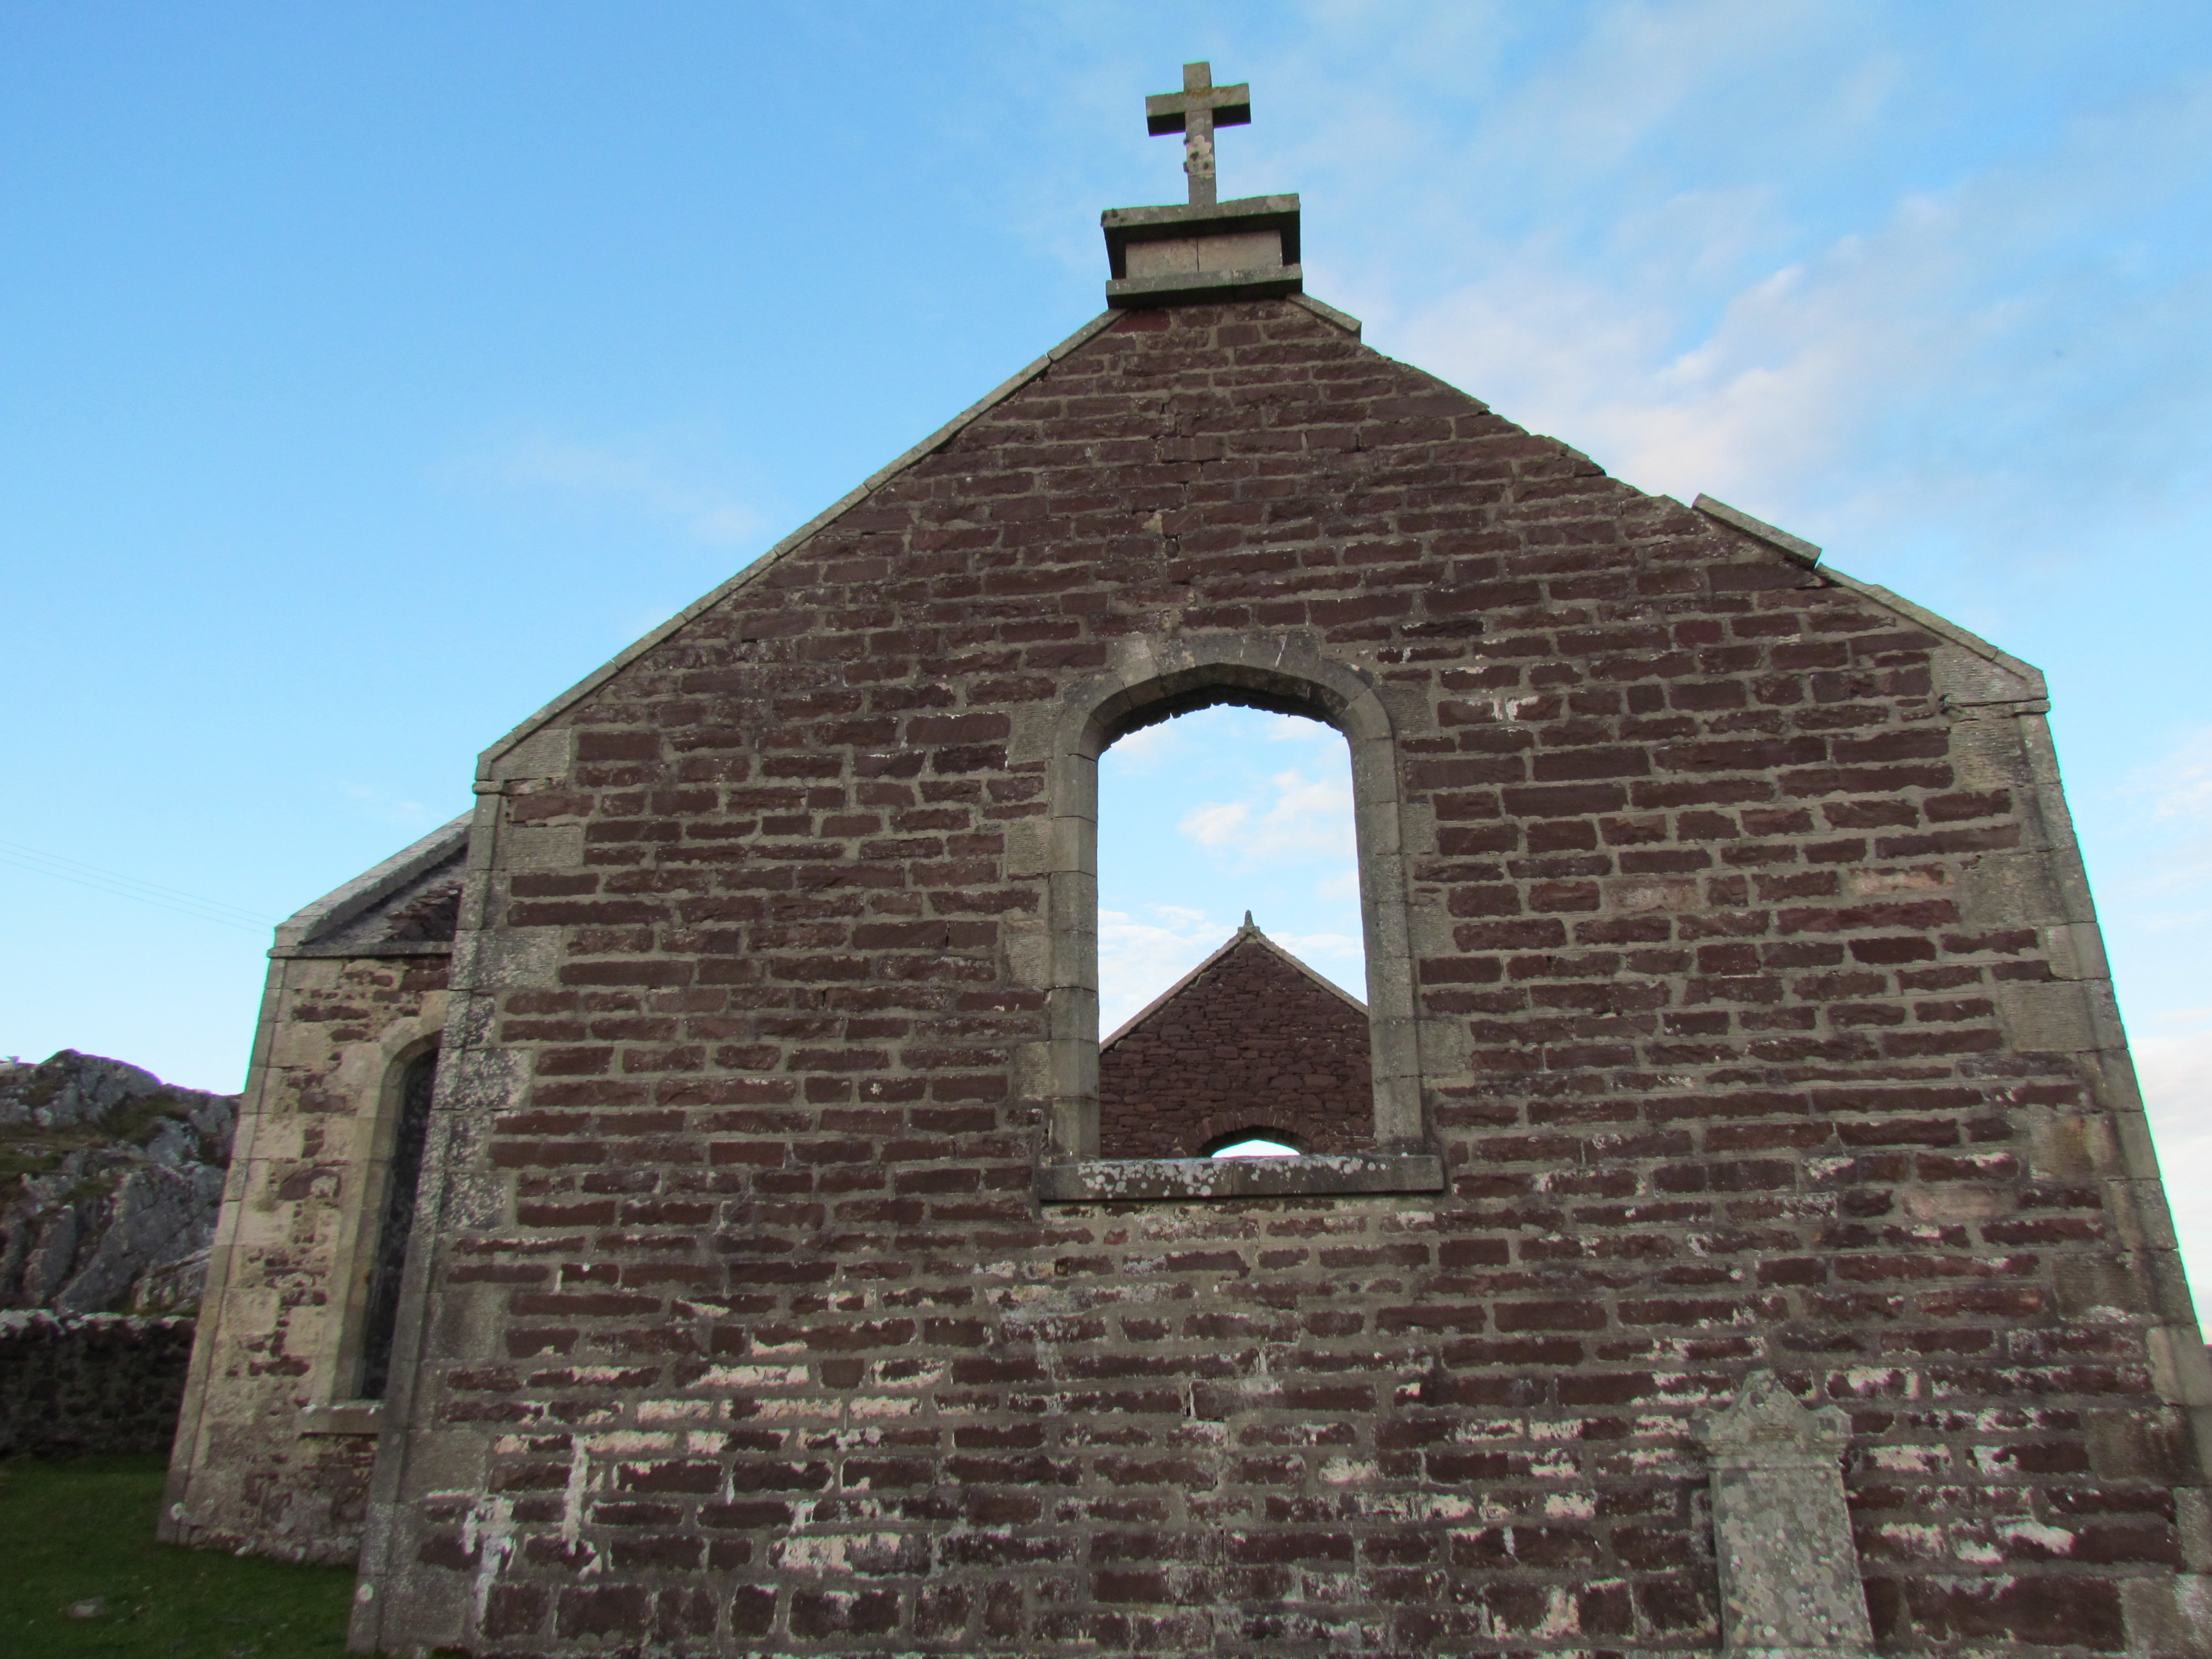 Stoer church